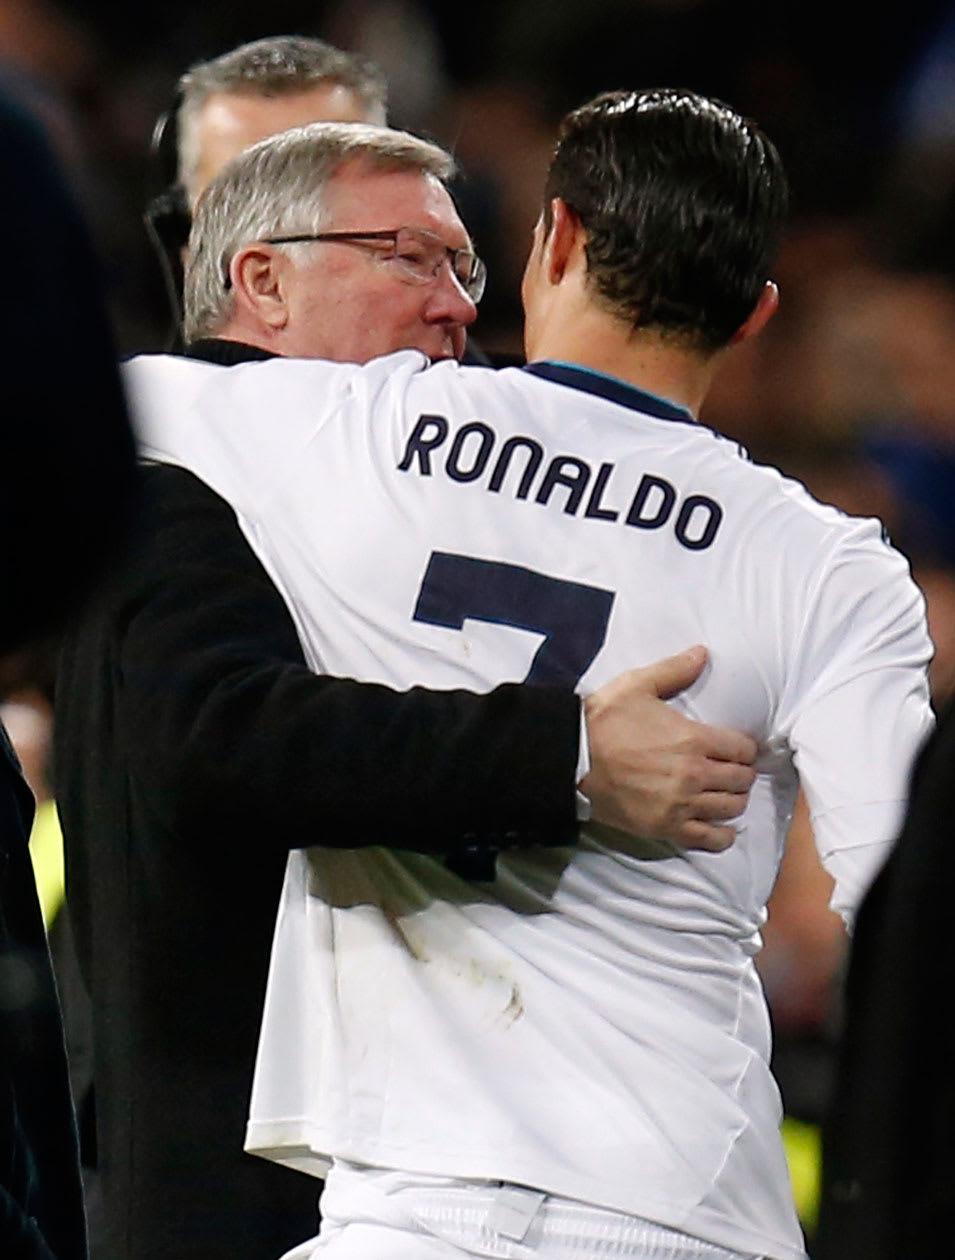 Manchester United coach Alex Ferguson with Real Madrid player Cristiano Ronaldo